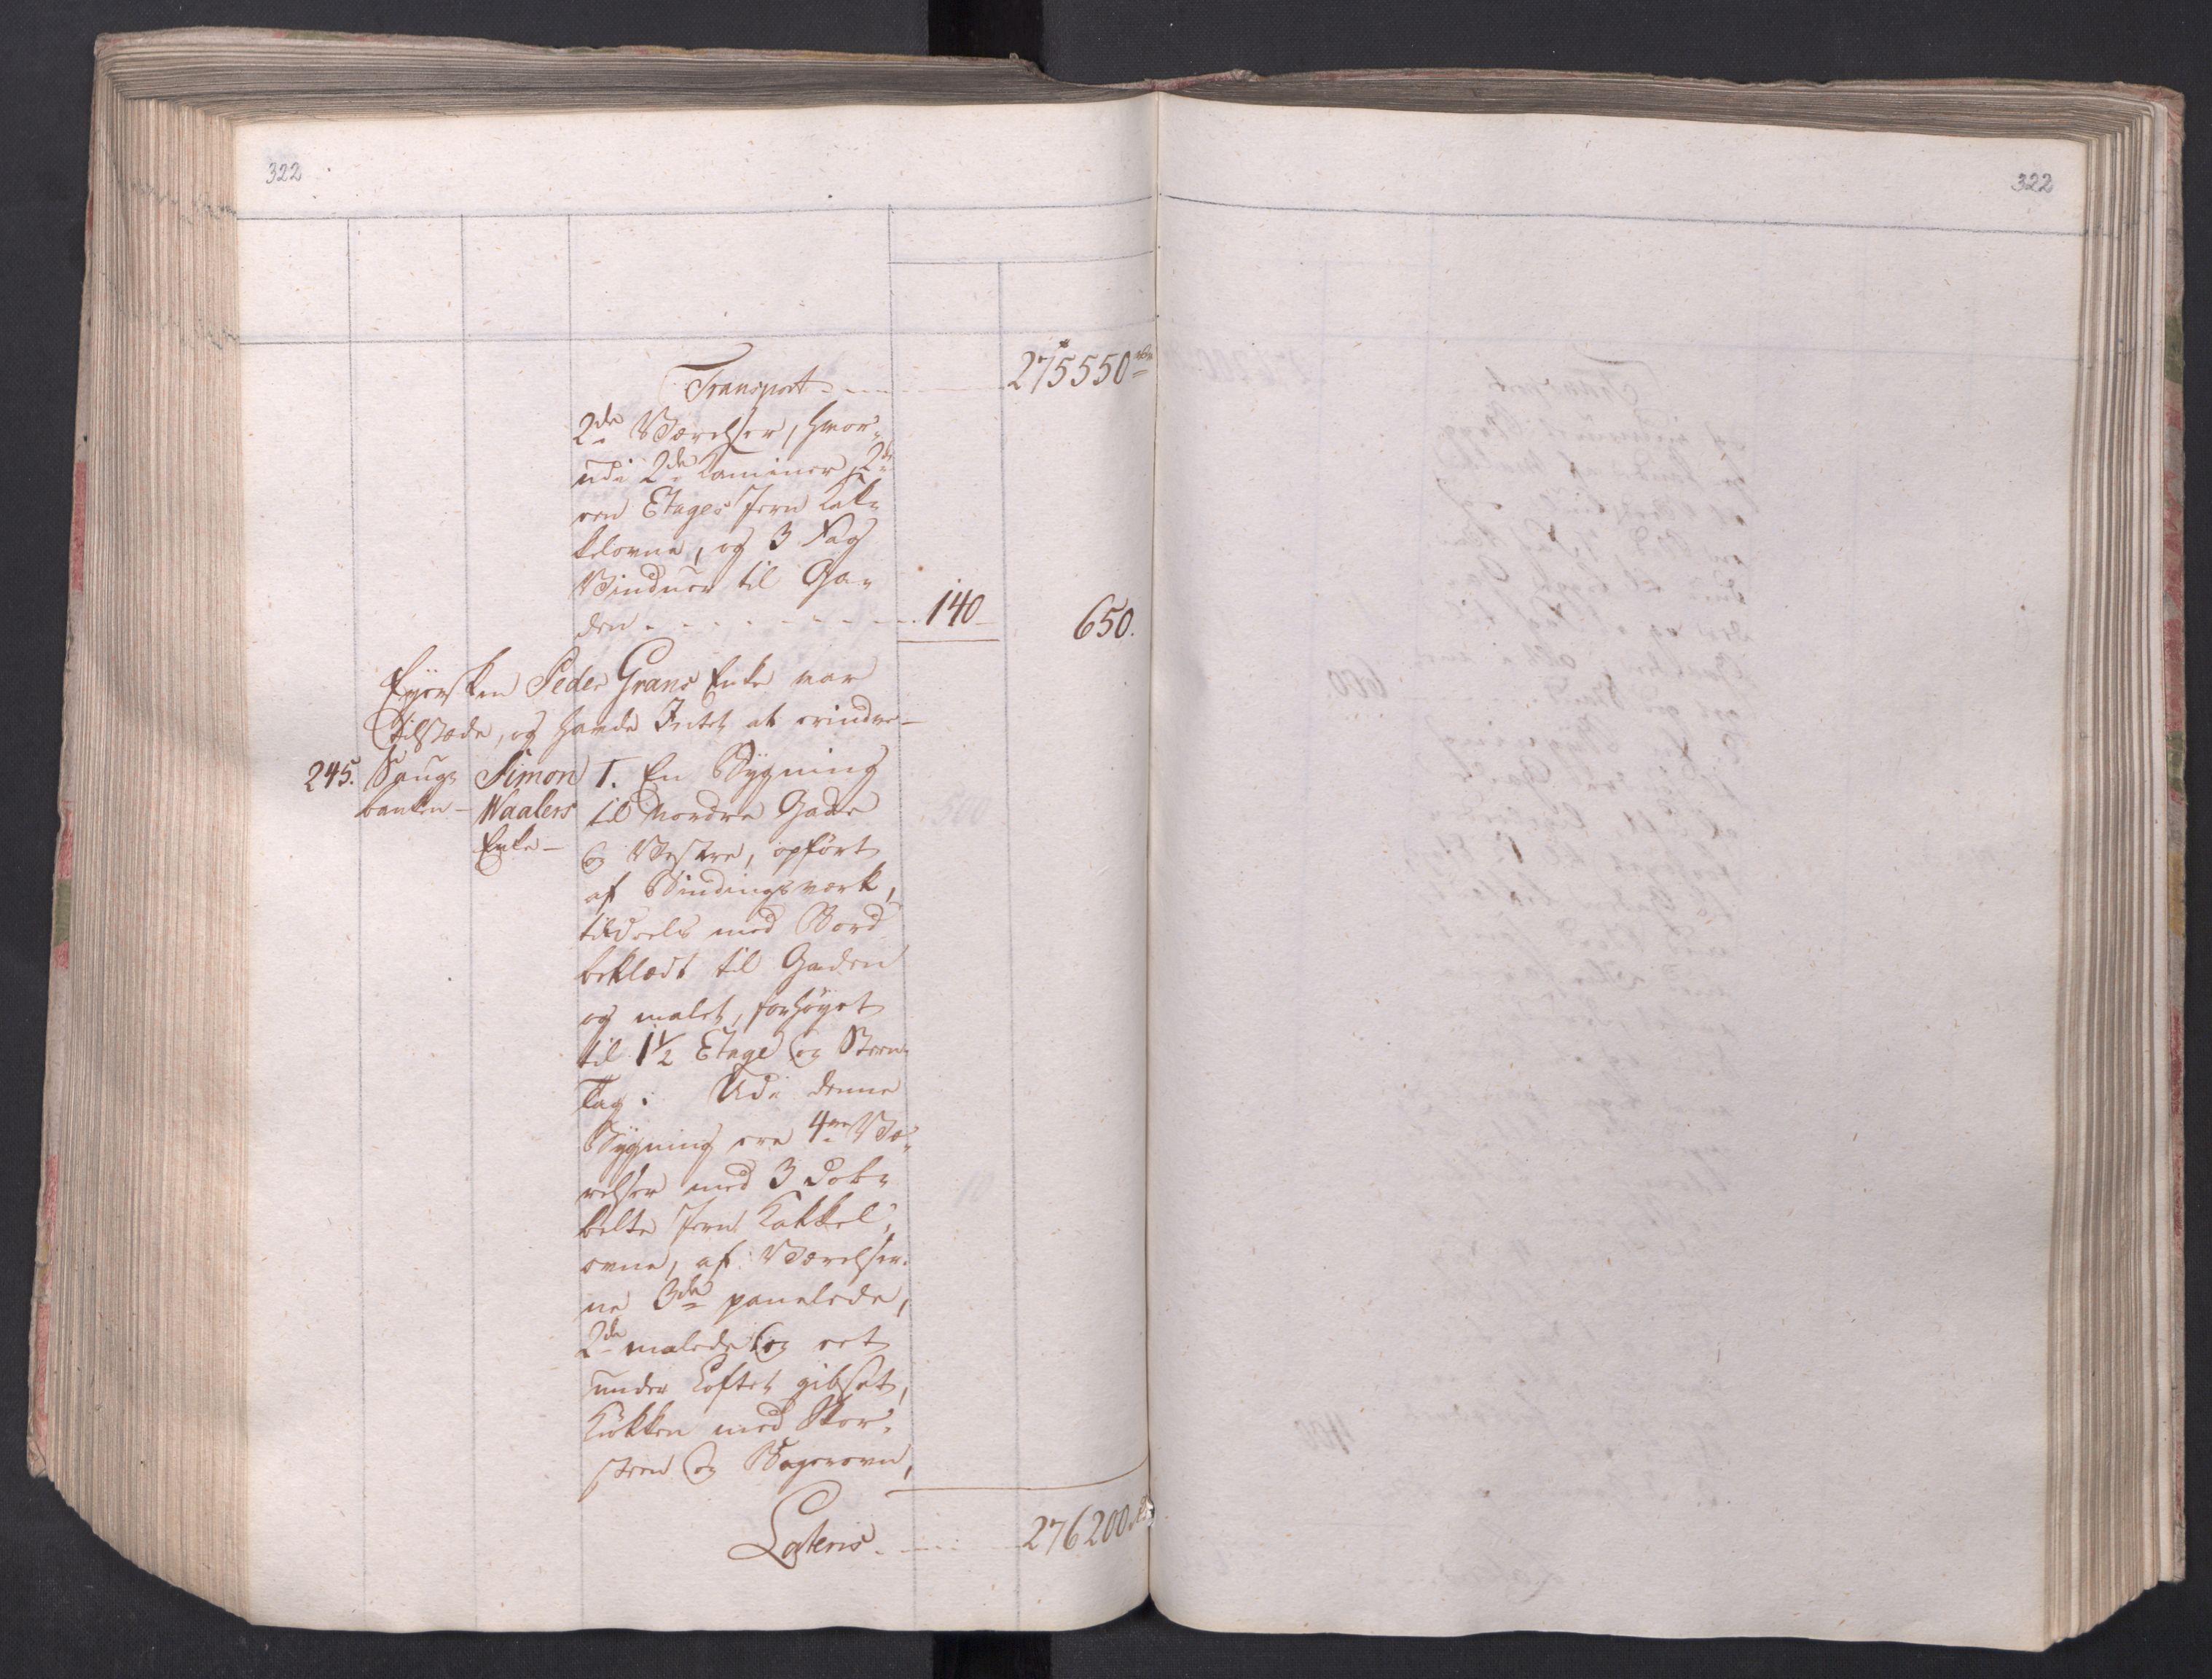 SAO, Kristiania stiftamt, I/Ia/L0015: Branntakster, 1797, s. 322